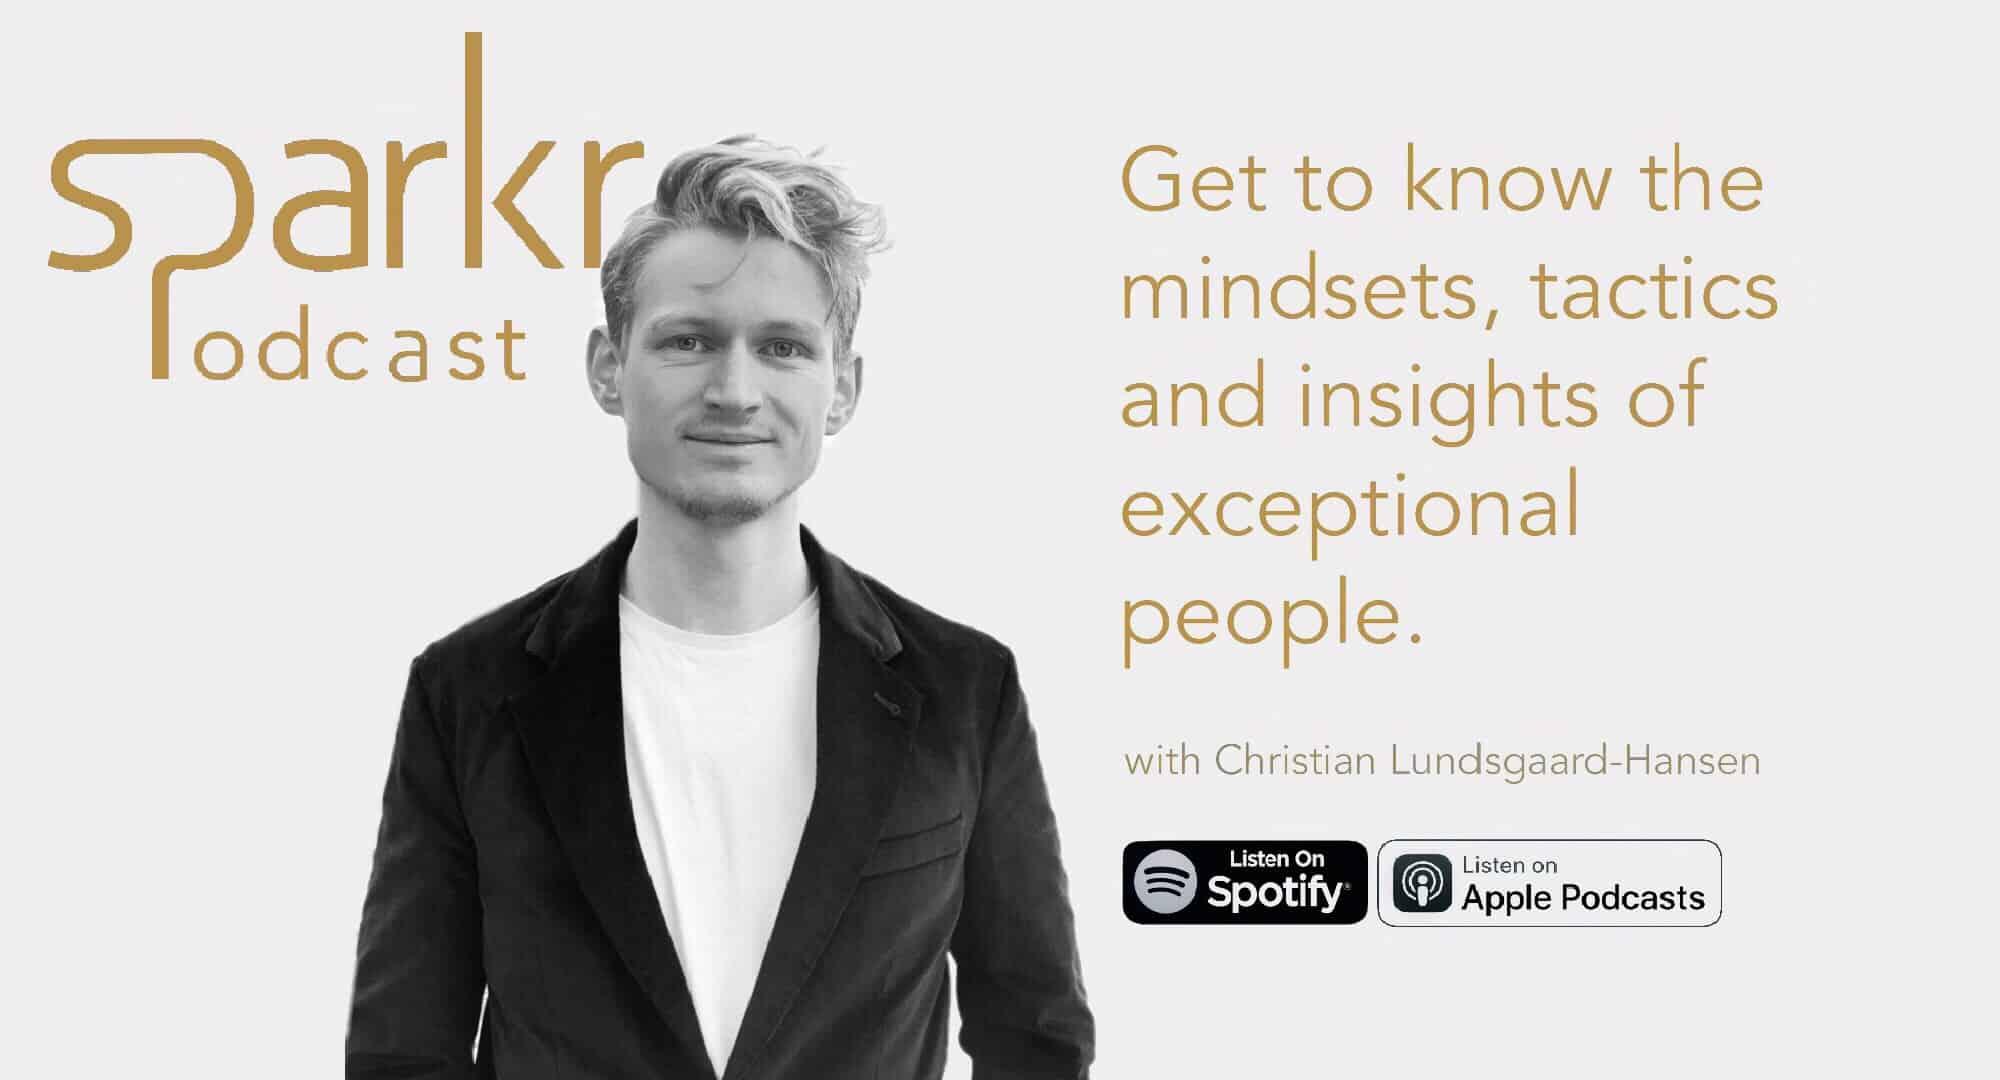 Sparkr Podcast